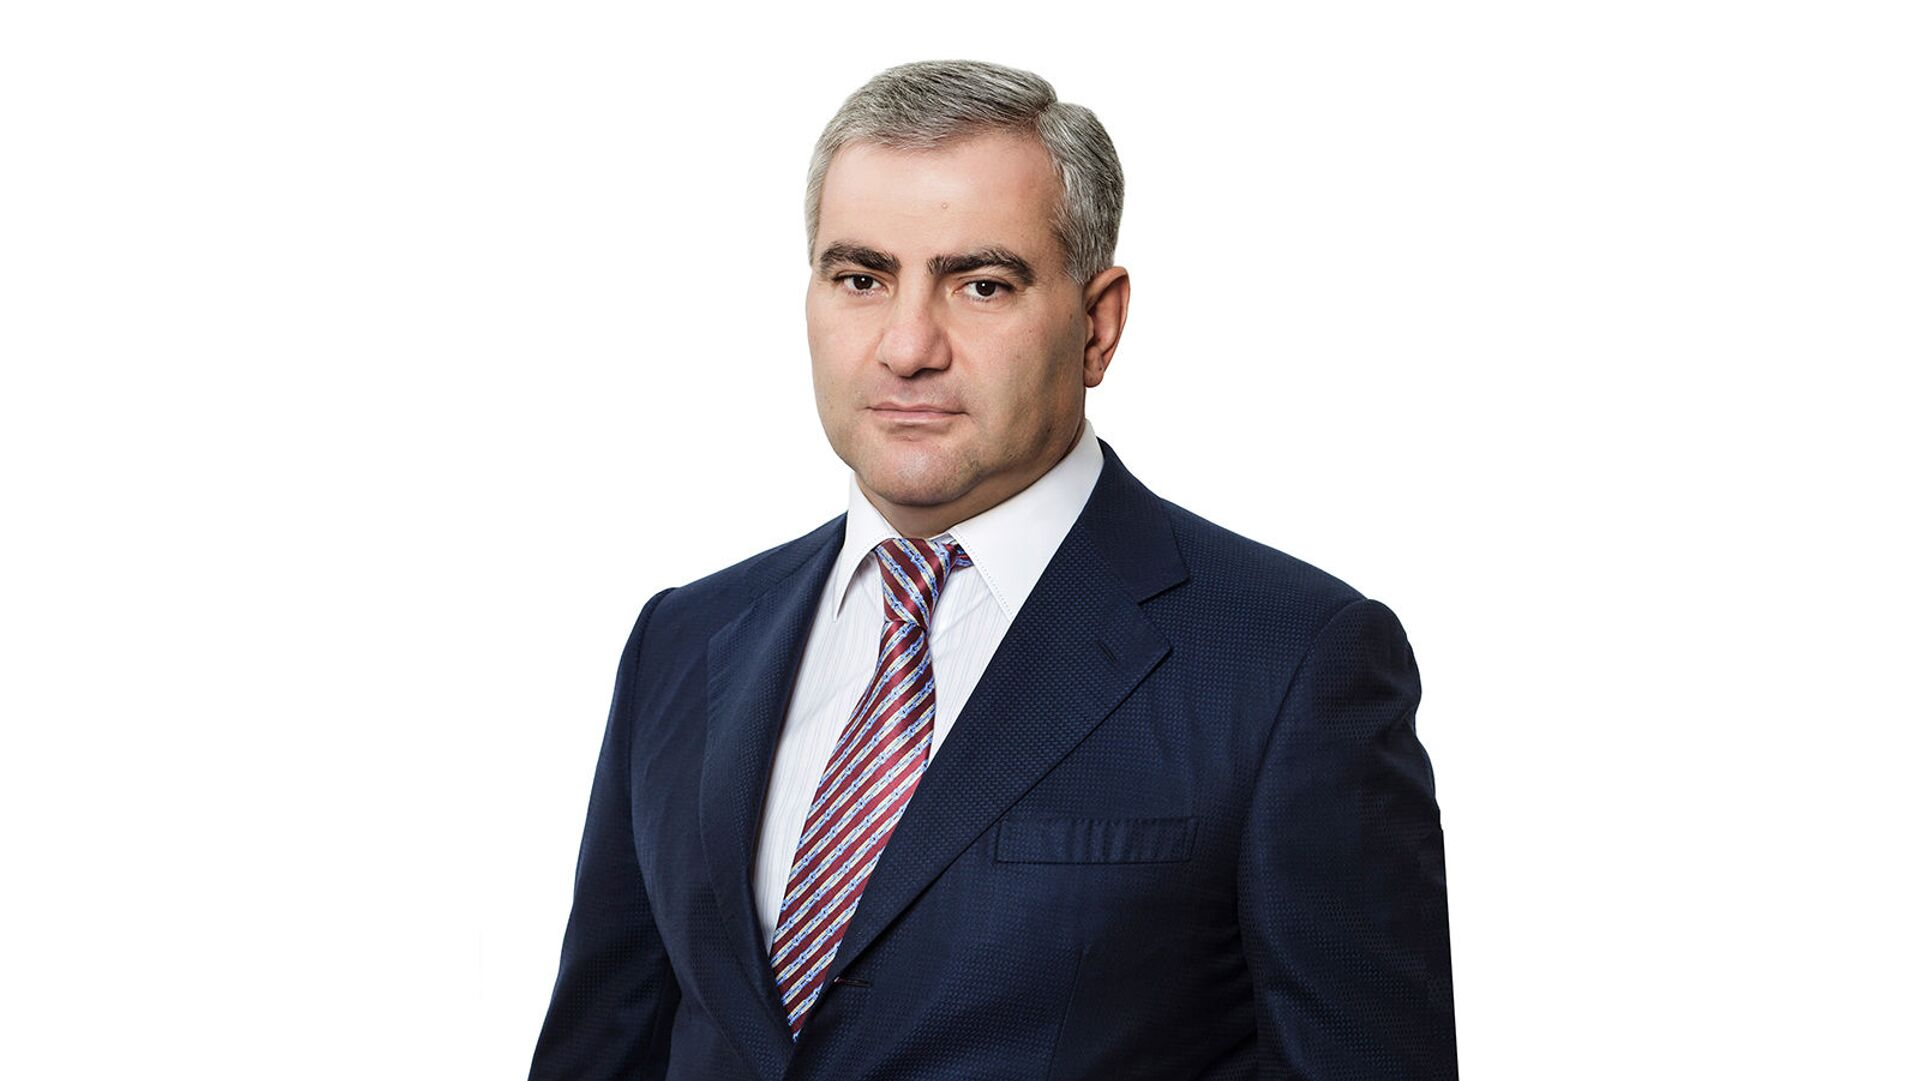 Самвел Карапетян - Sputnik Армения, 1920, 09.08.2021